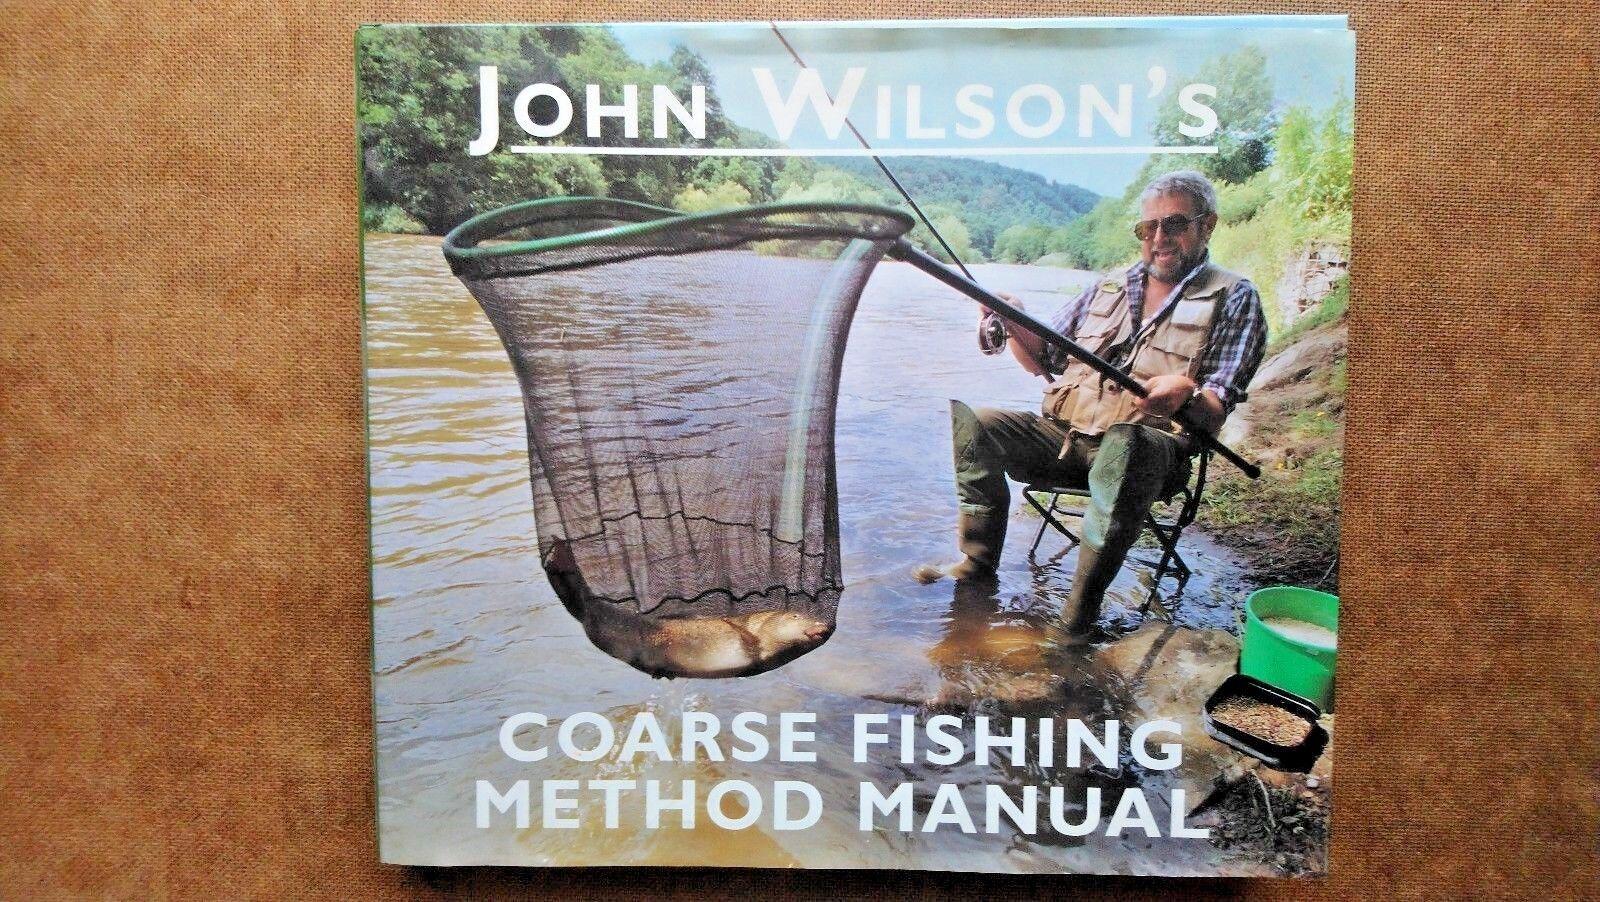 John Wilson's Coarse Fishing Manual by John Wilson (Hardback , 1997)